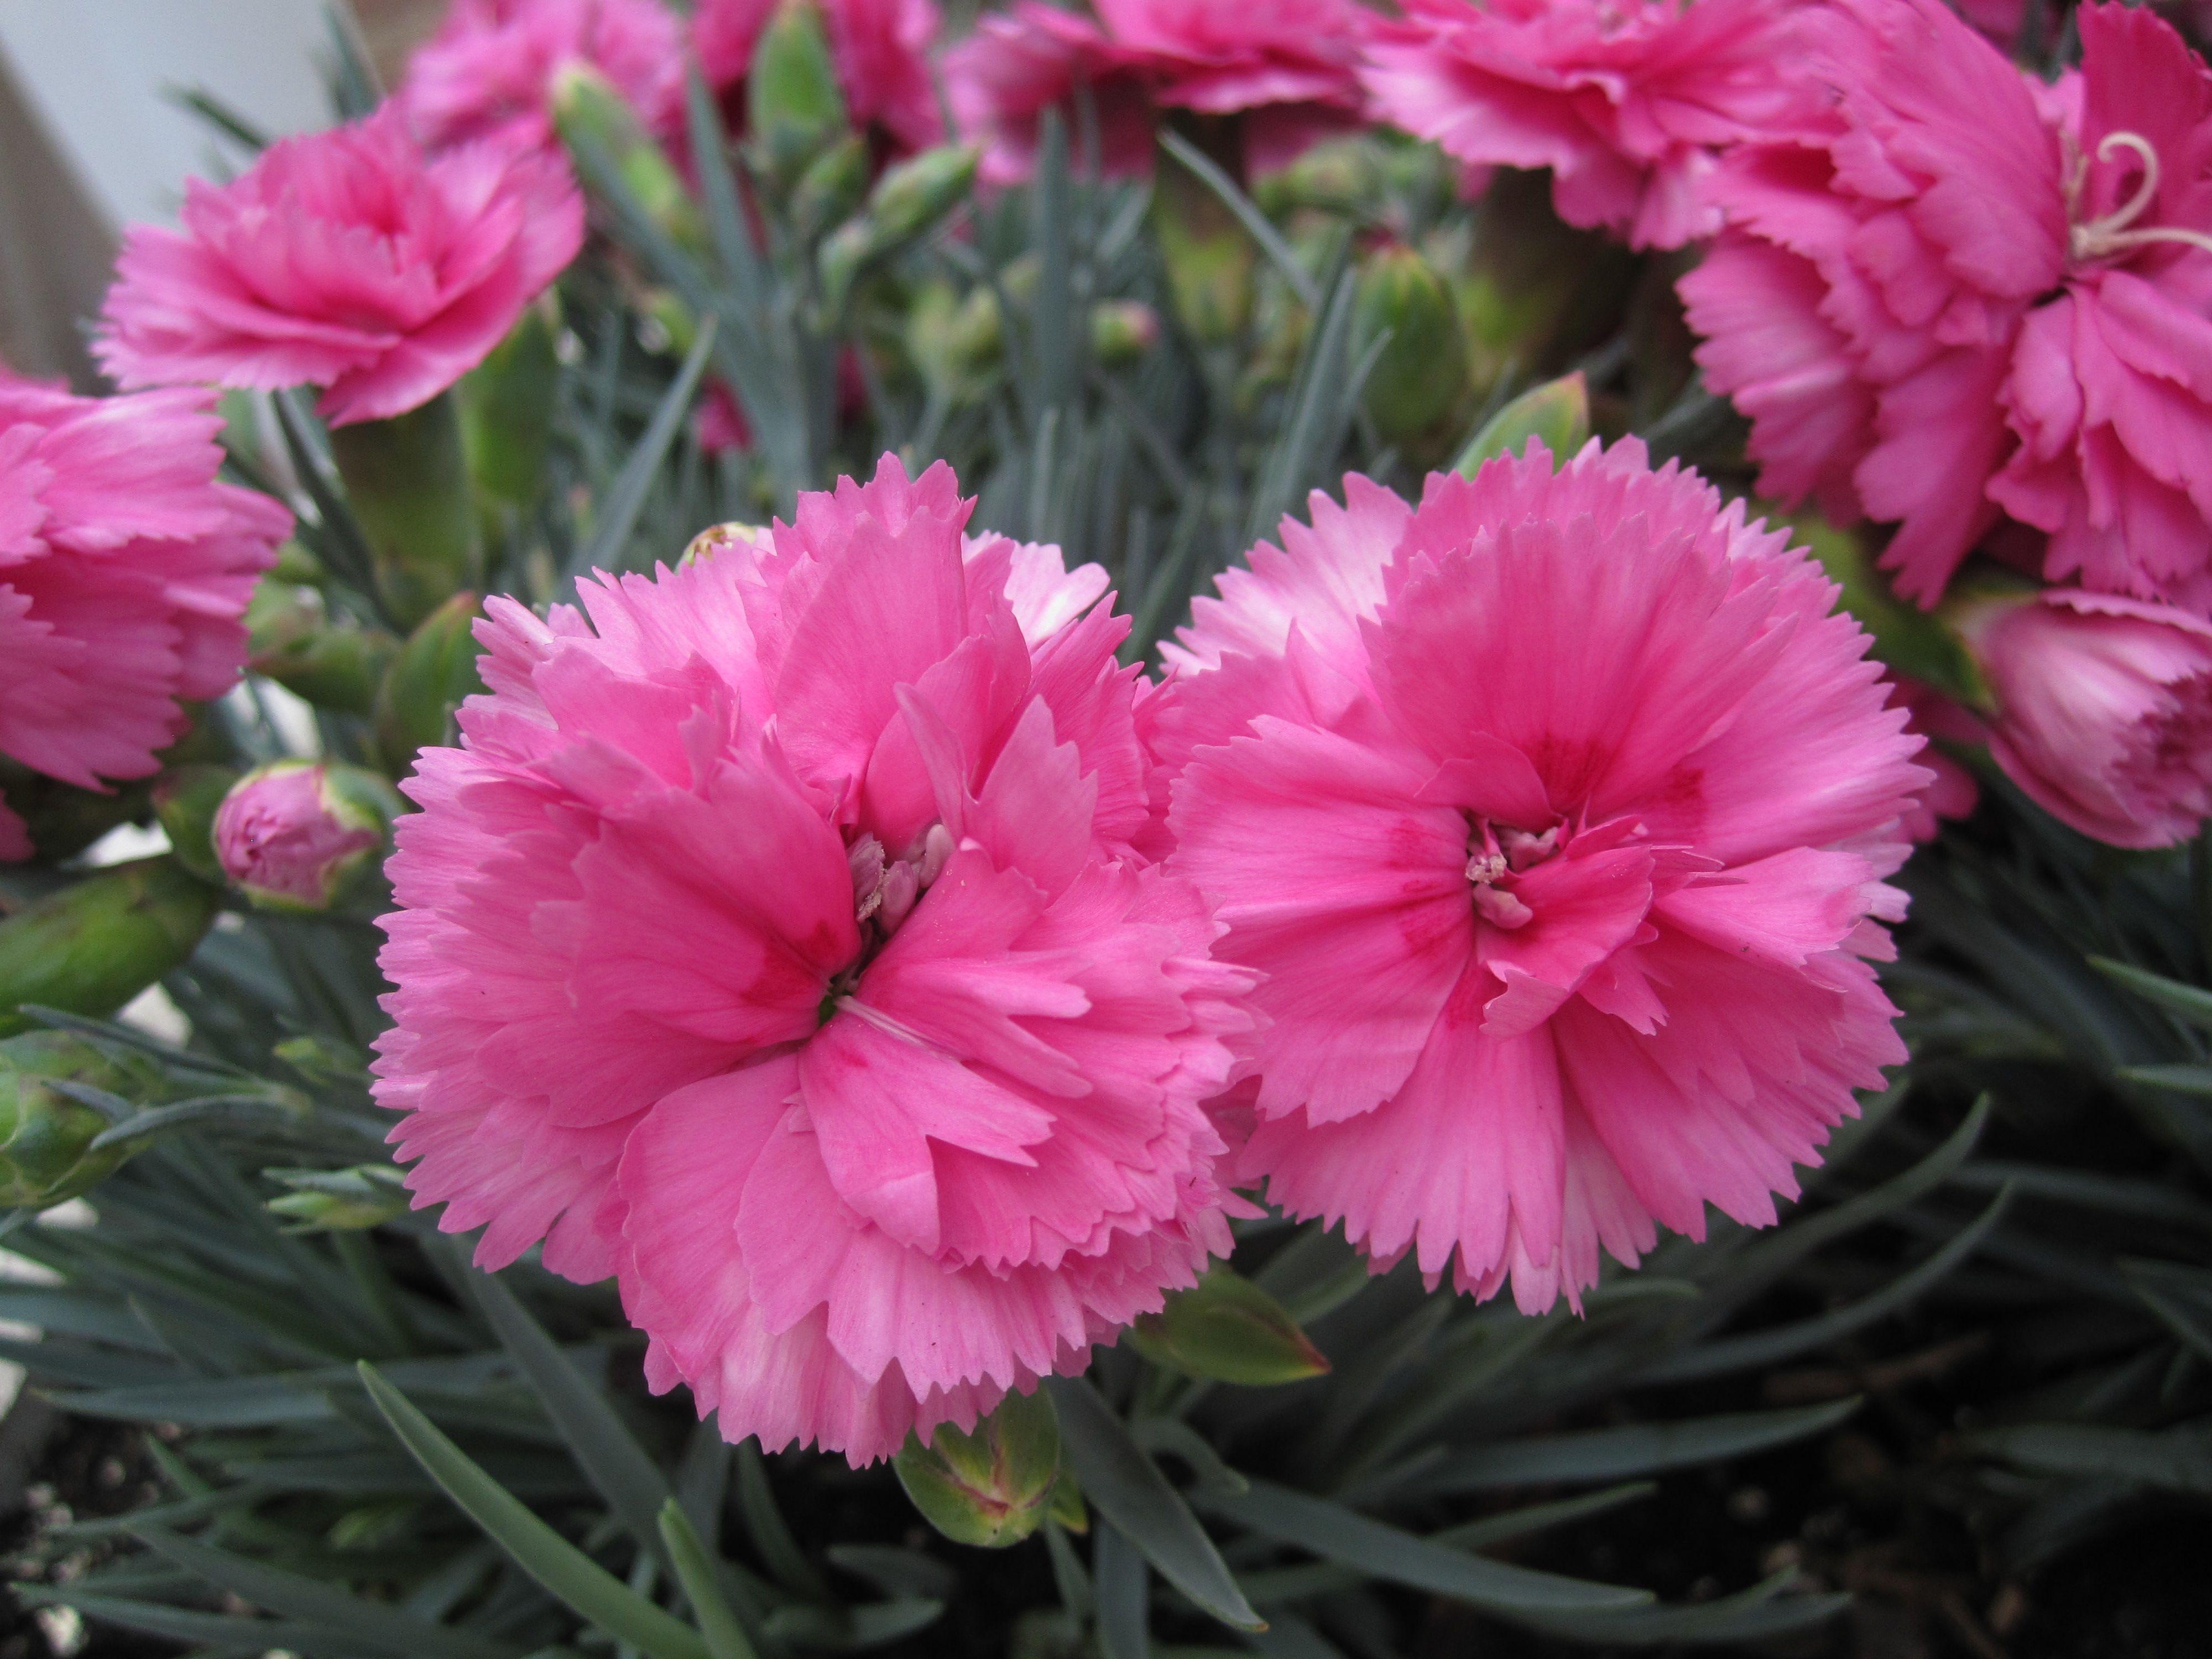 Dianthus Caryophyllus Dianthus Caryophyllus Pink Perennials Beautiful Flowers